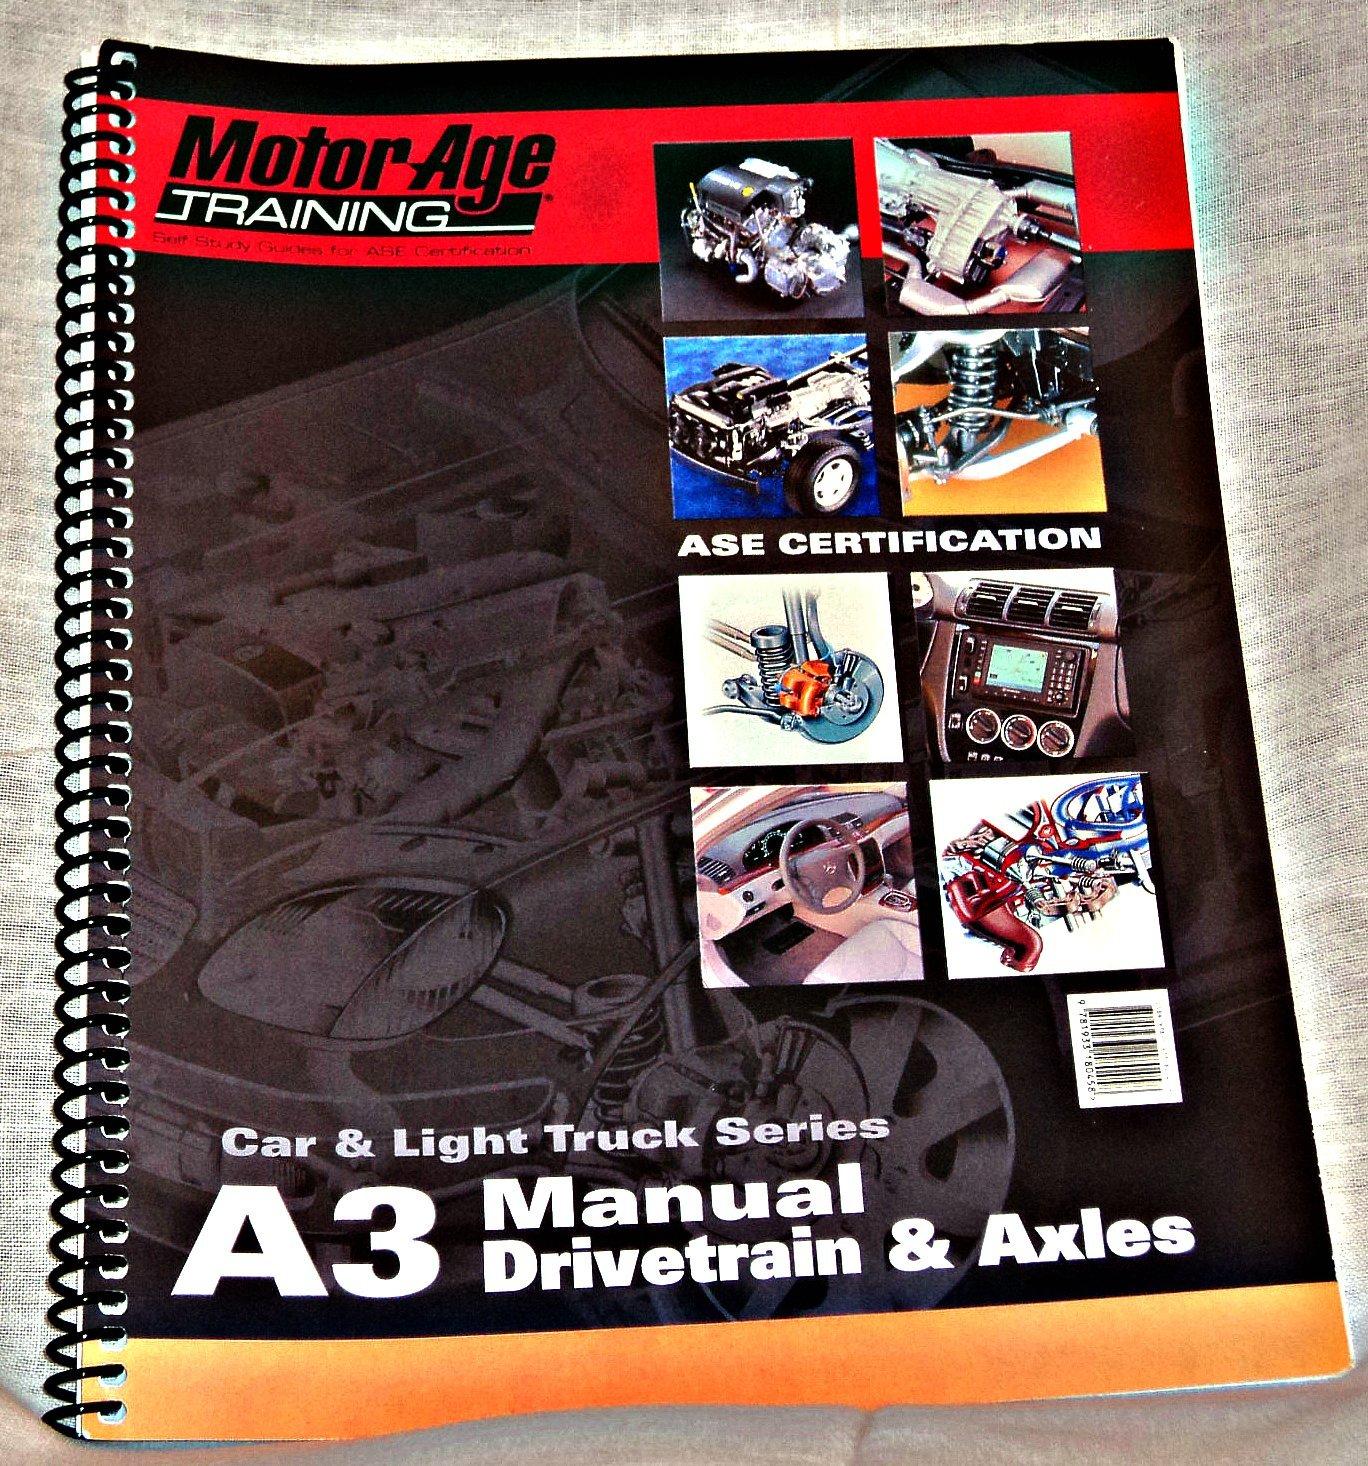 Self-Study Guides for ASE Certification: A3- Manual Drivetrain & Axles  (ADVASEA3): Motor Age Training: 9781933180458: Amazon.com: Books